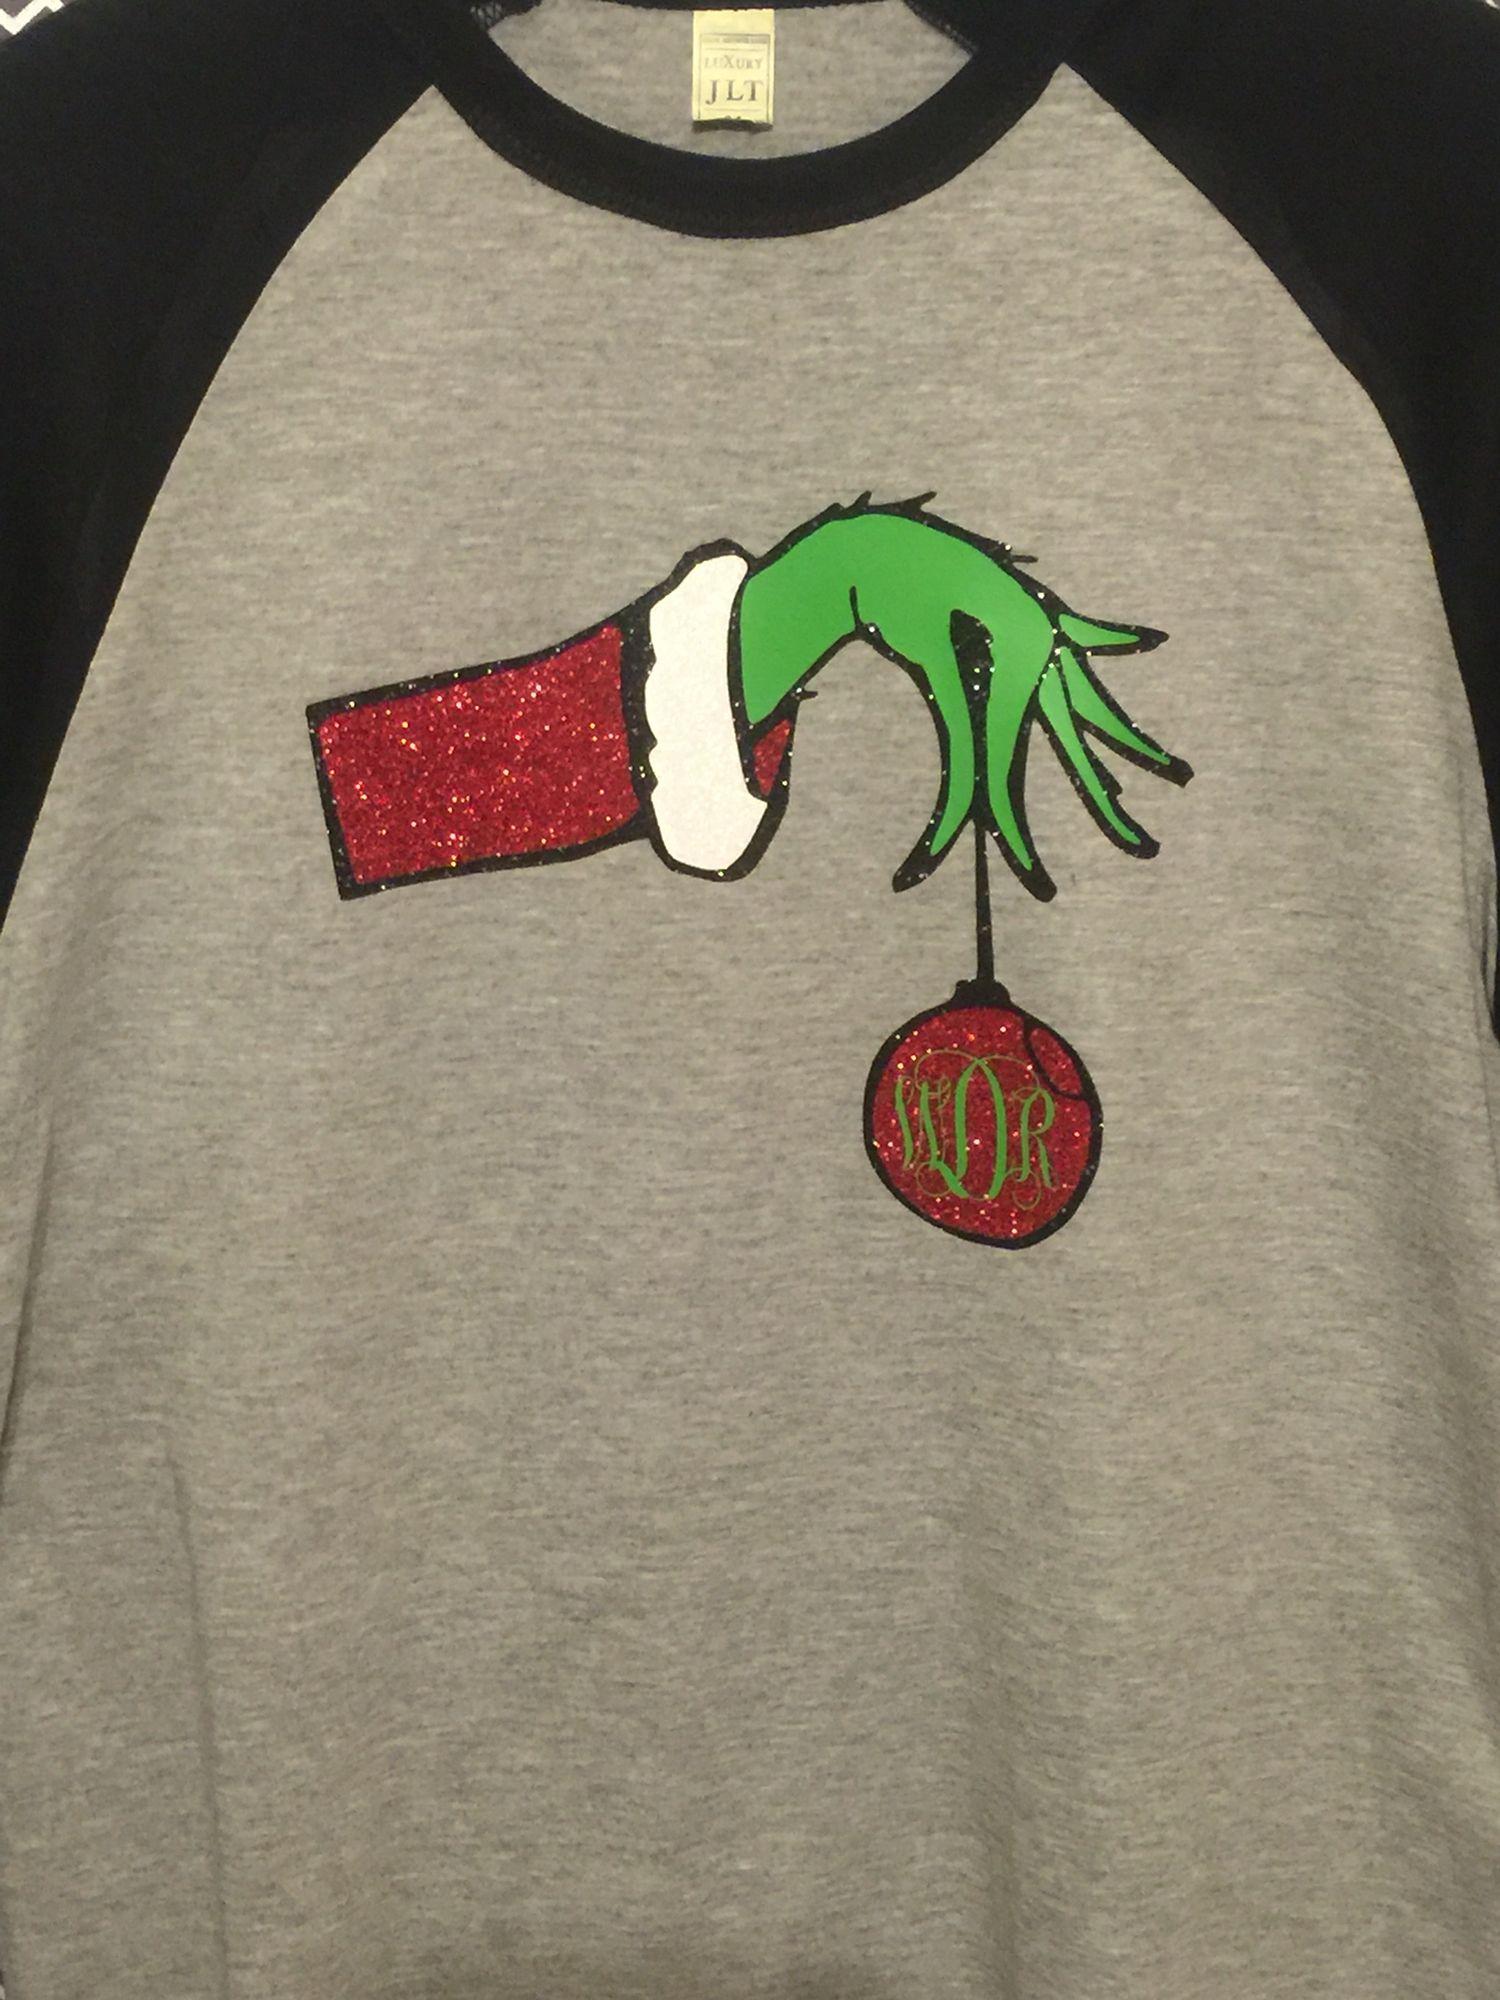 76ca4180b945 Grinch hand glitter shirt www.harleyshottitude.com | Custom shirts ...